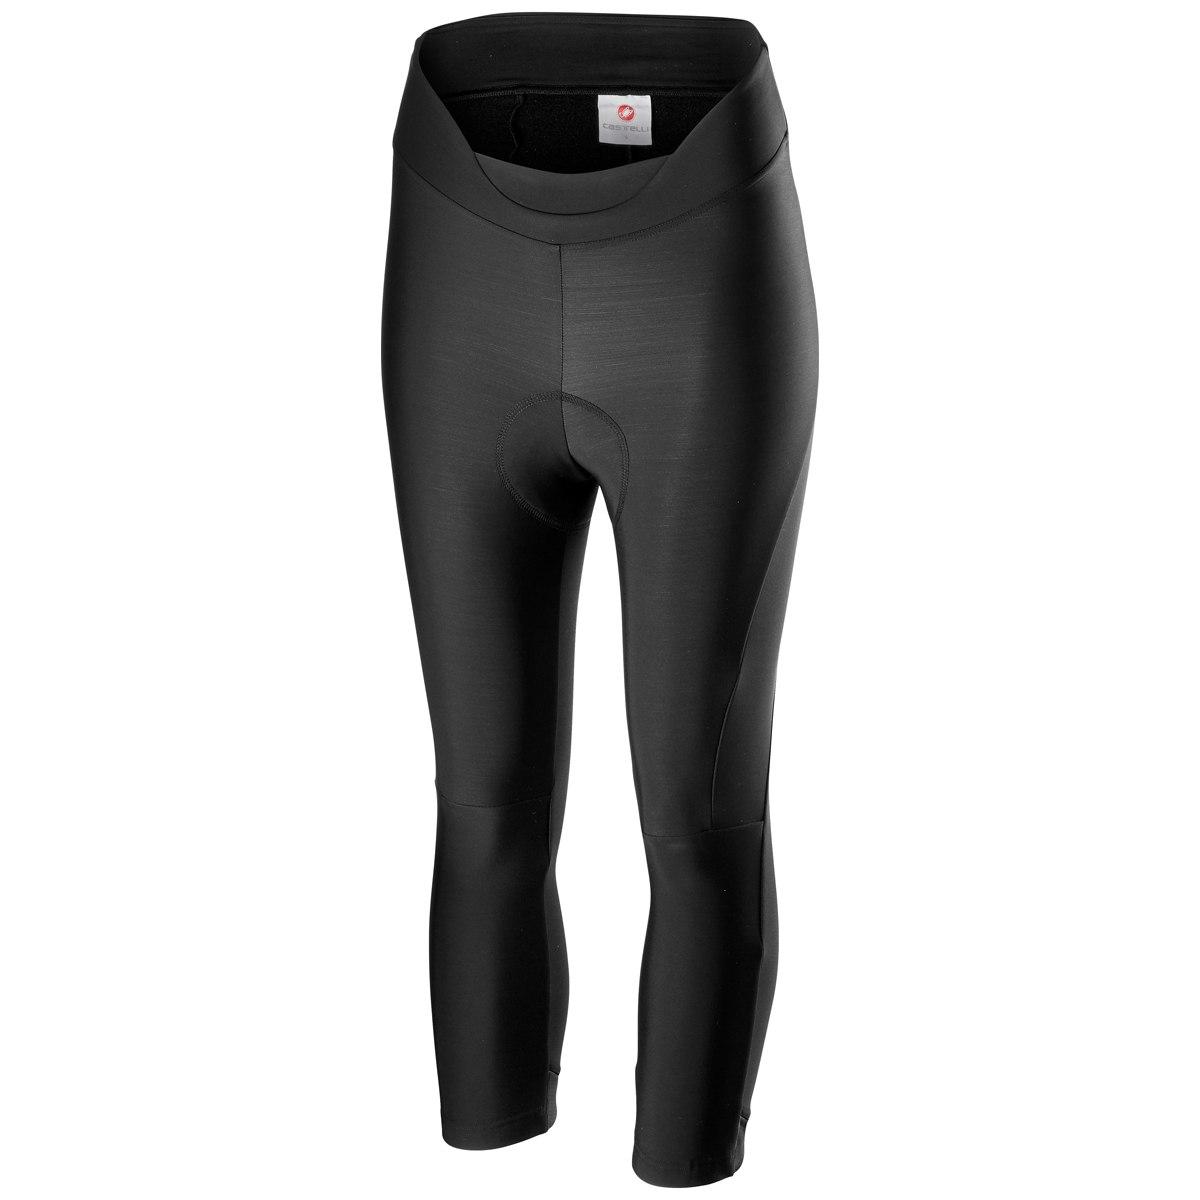 Image of Castelli Velocissima Knicker Women's - black 010